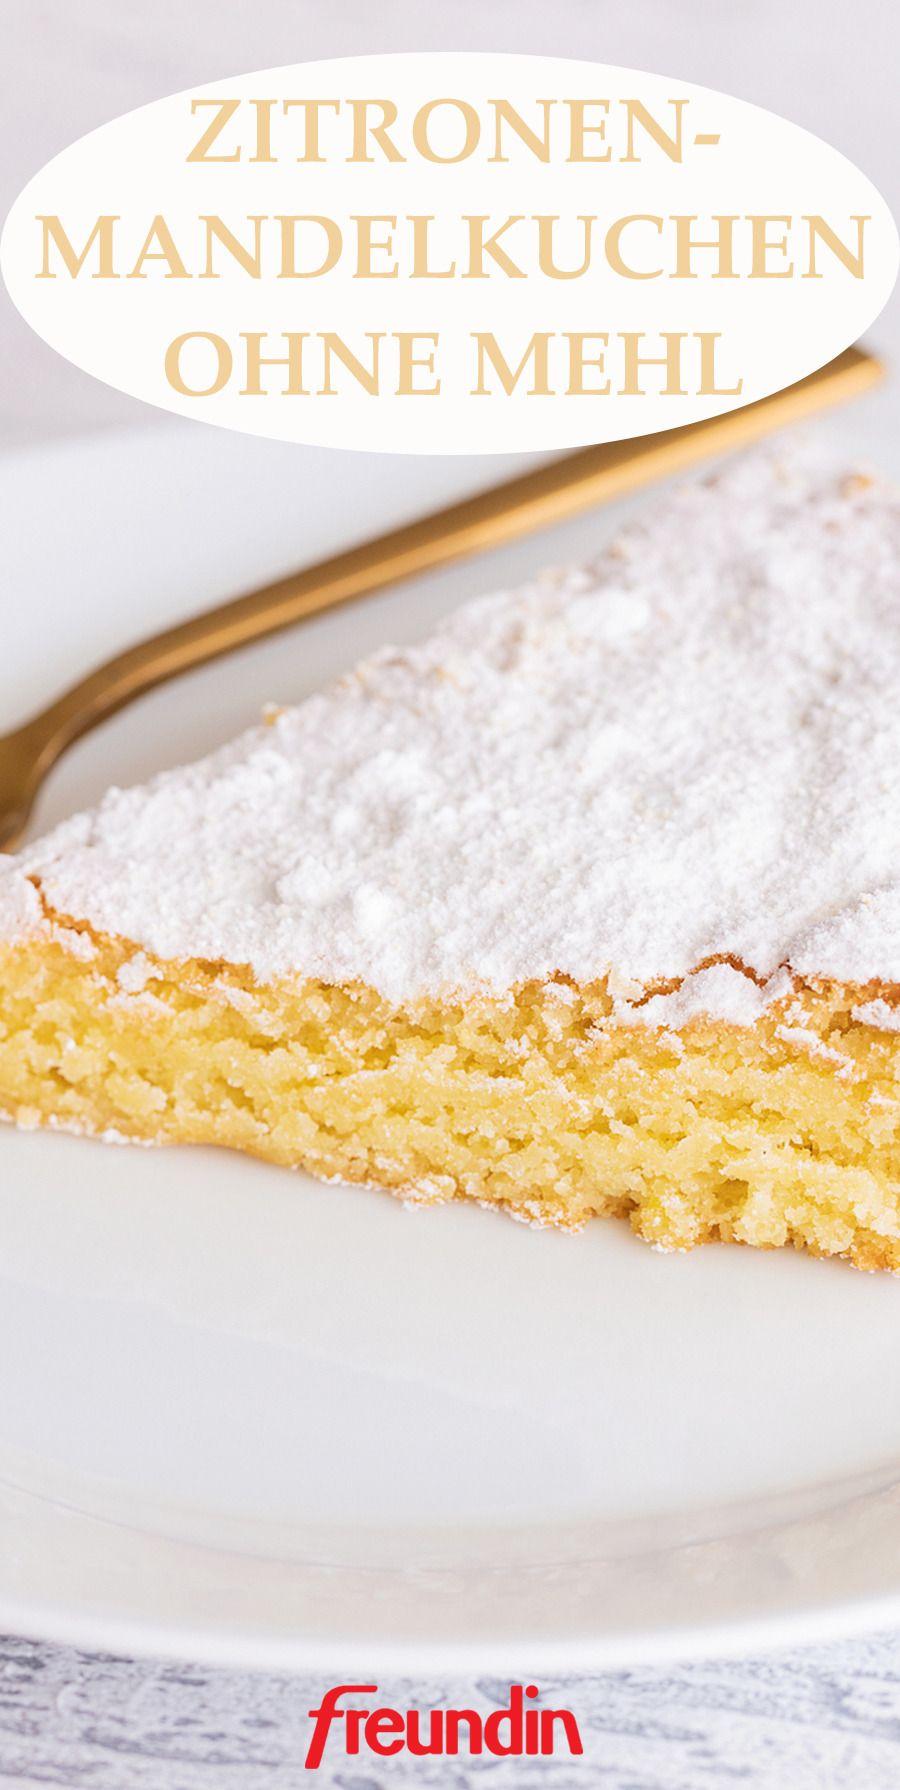 Rezept: Zitronen-Mandelkuchen ohne Mehl | freundin.de